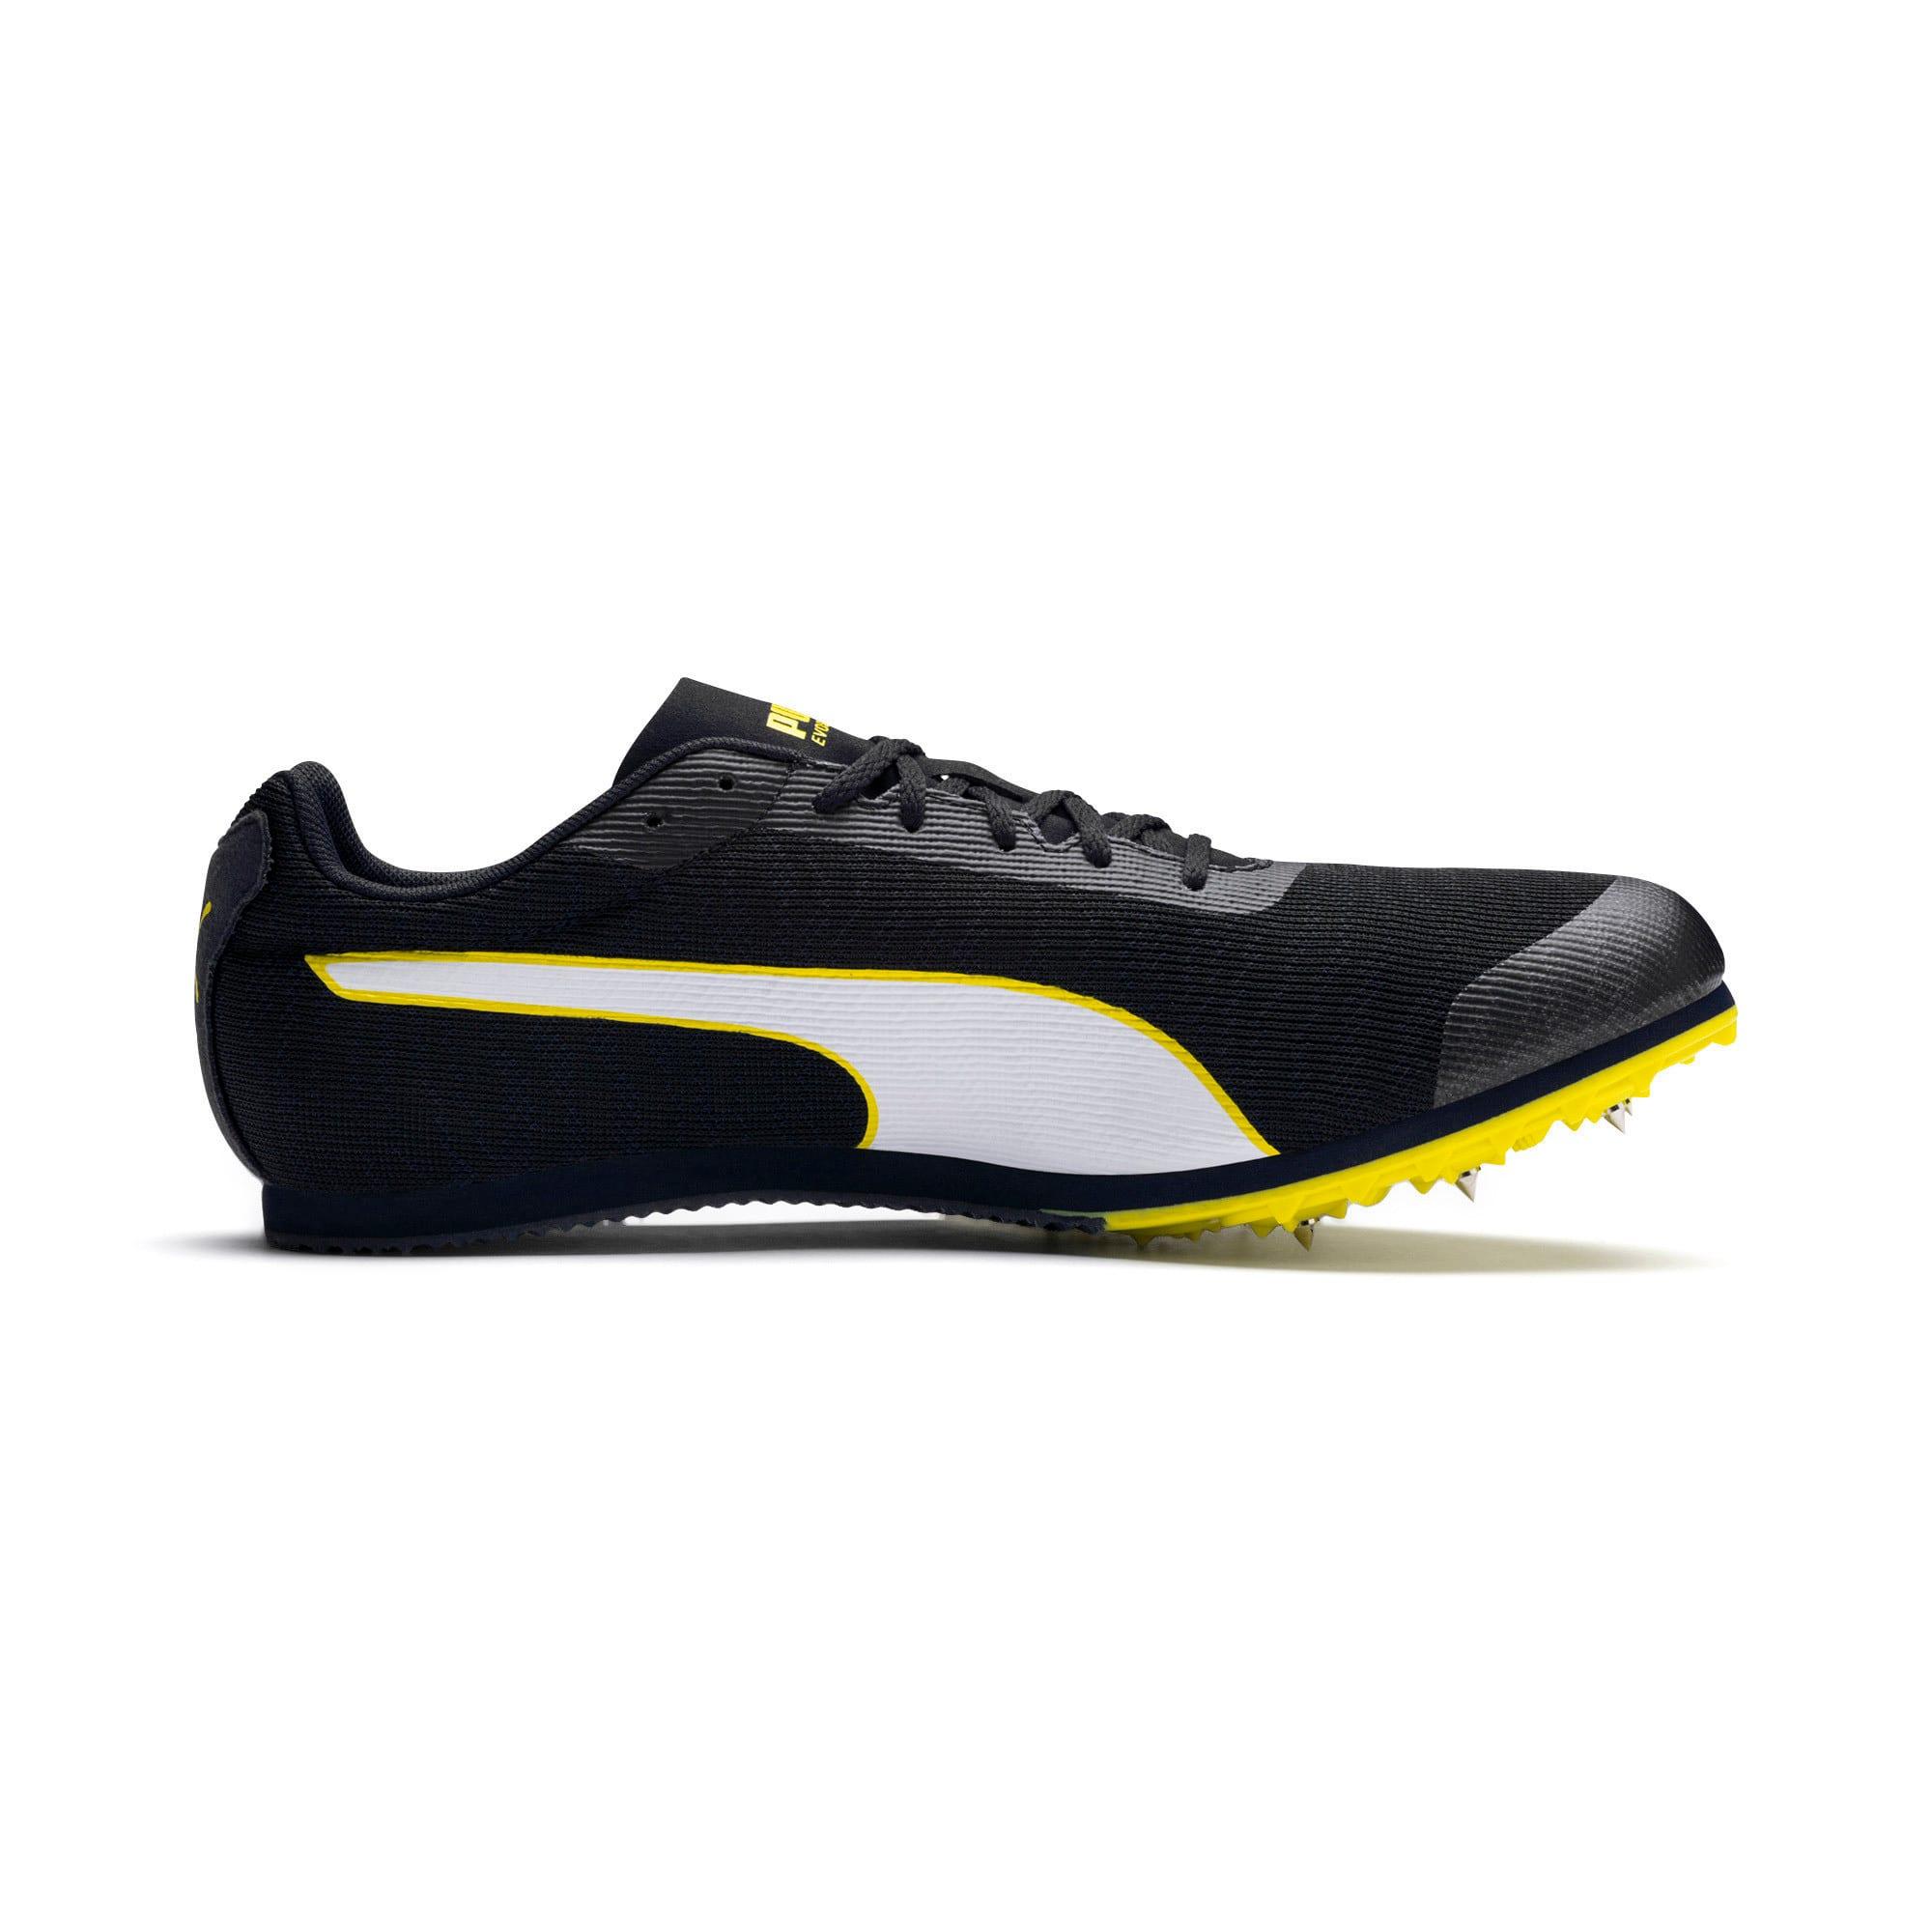 Thumbnail 5 of evoSPEED Star 6 Men's Track Spikes, Peacoat-Puma Black-Yellow, medium